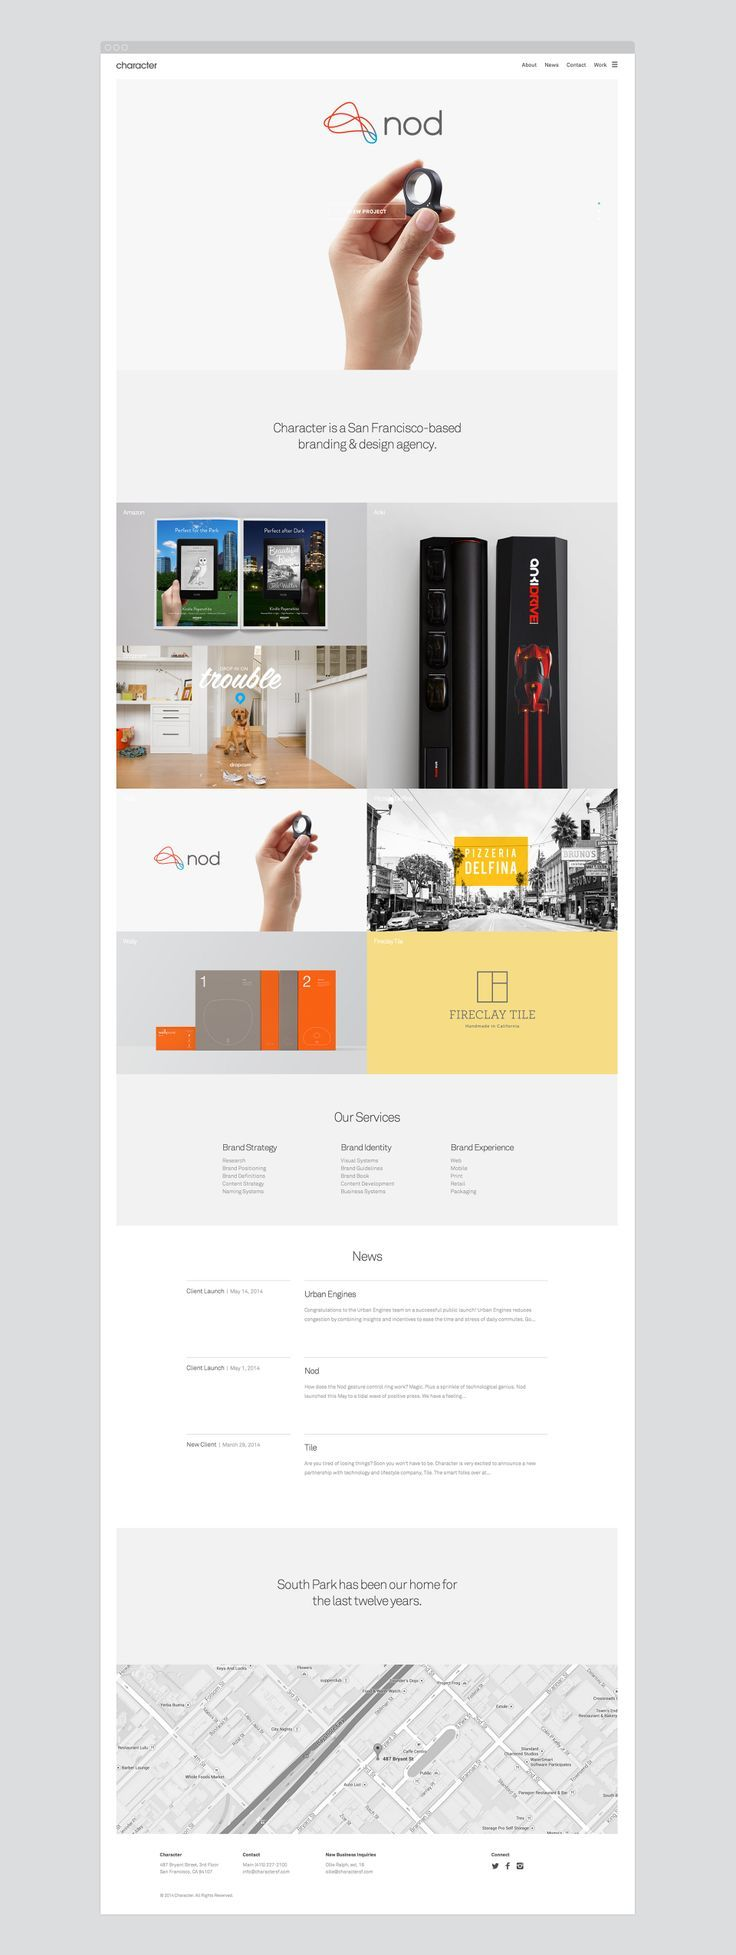 Web236 web design i